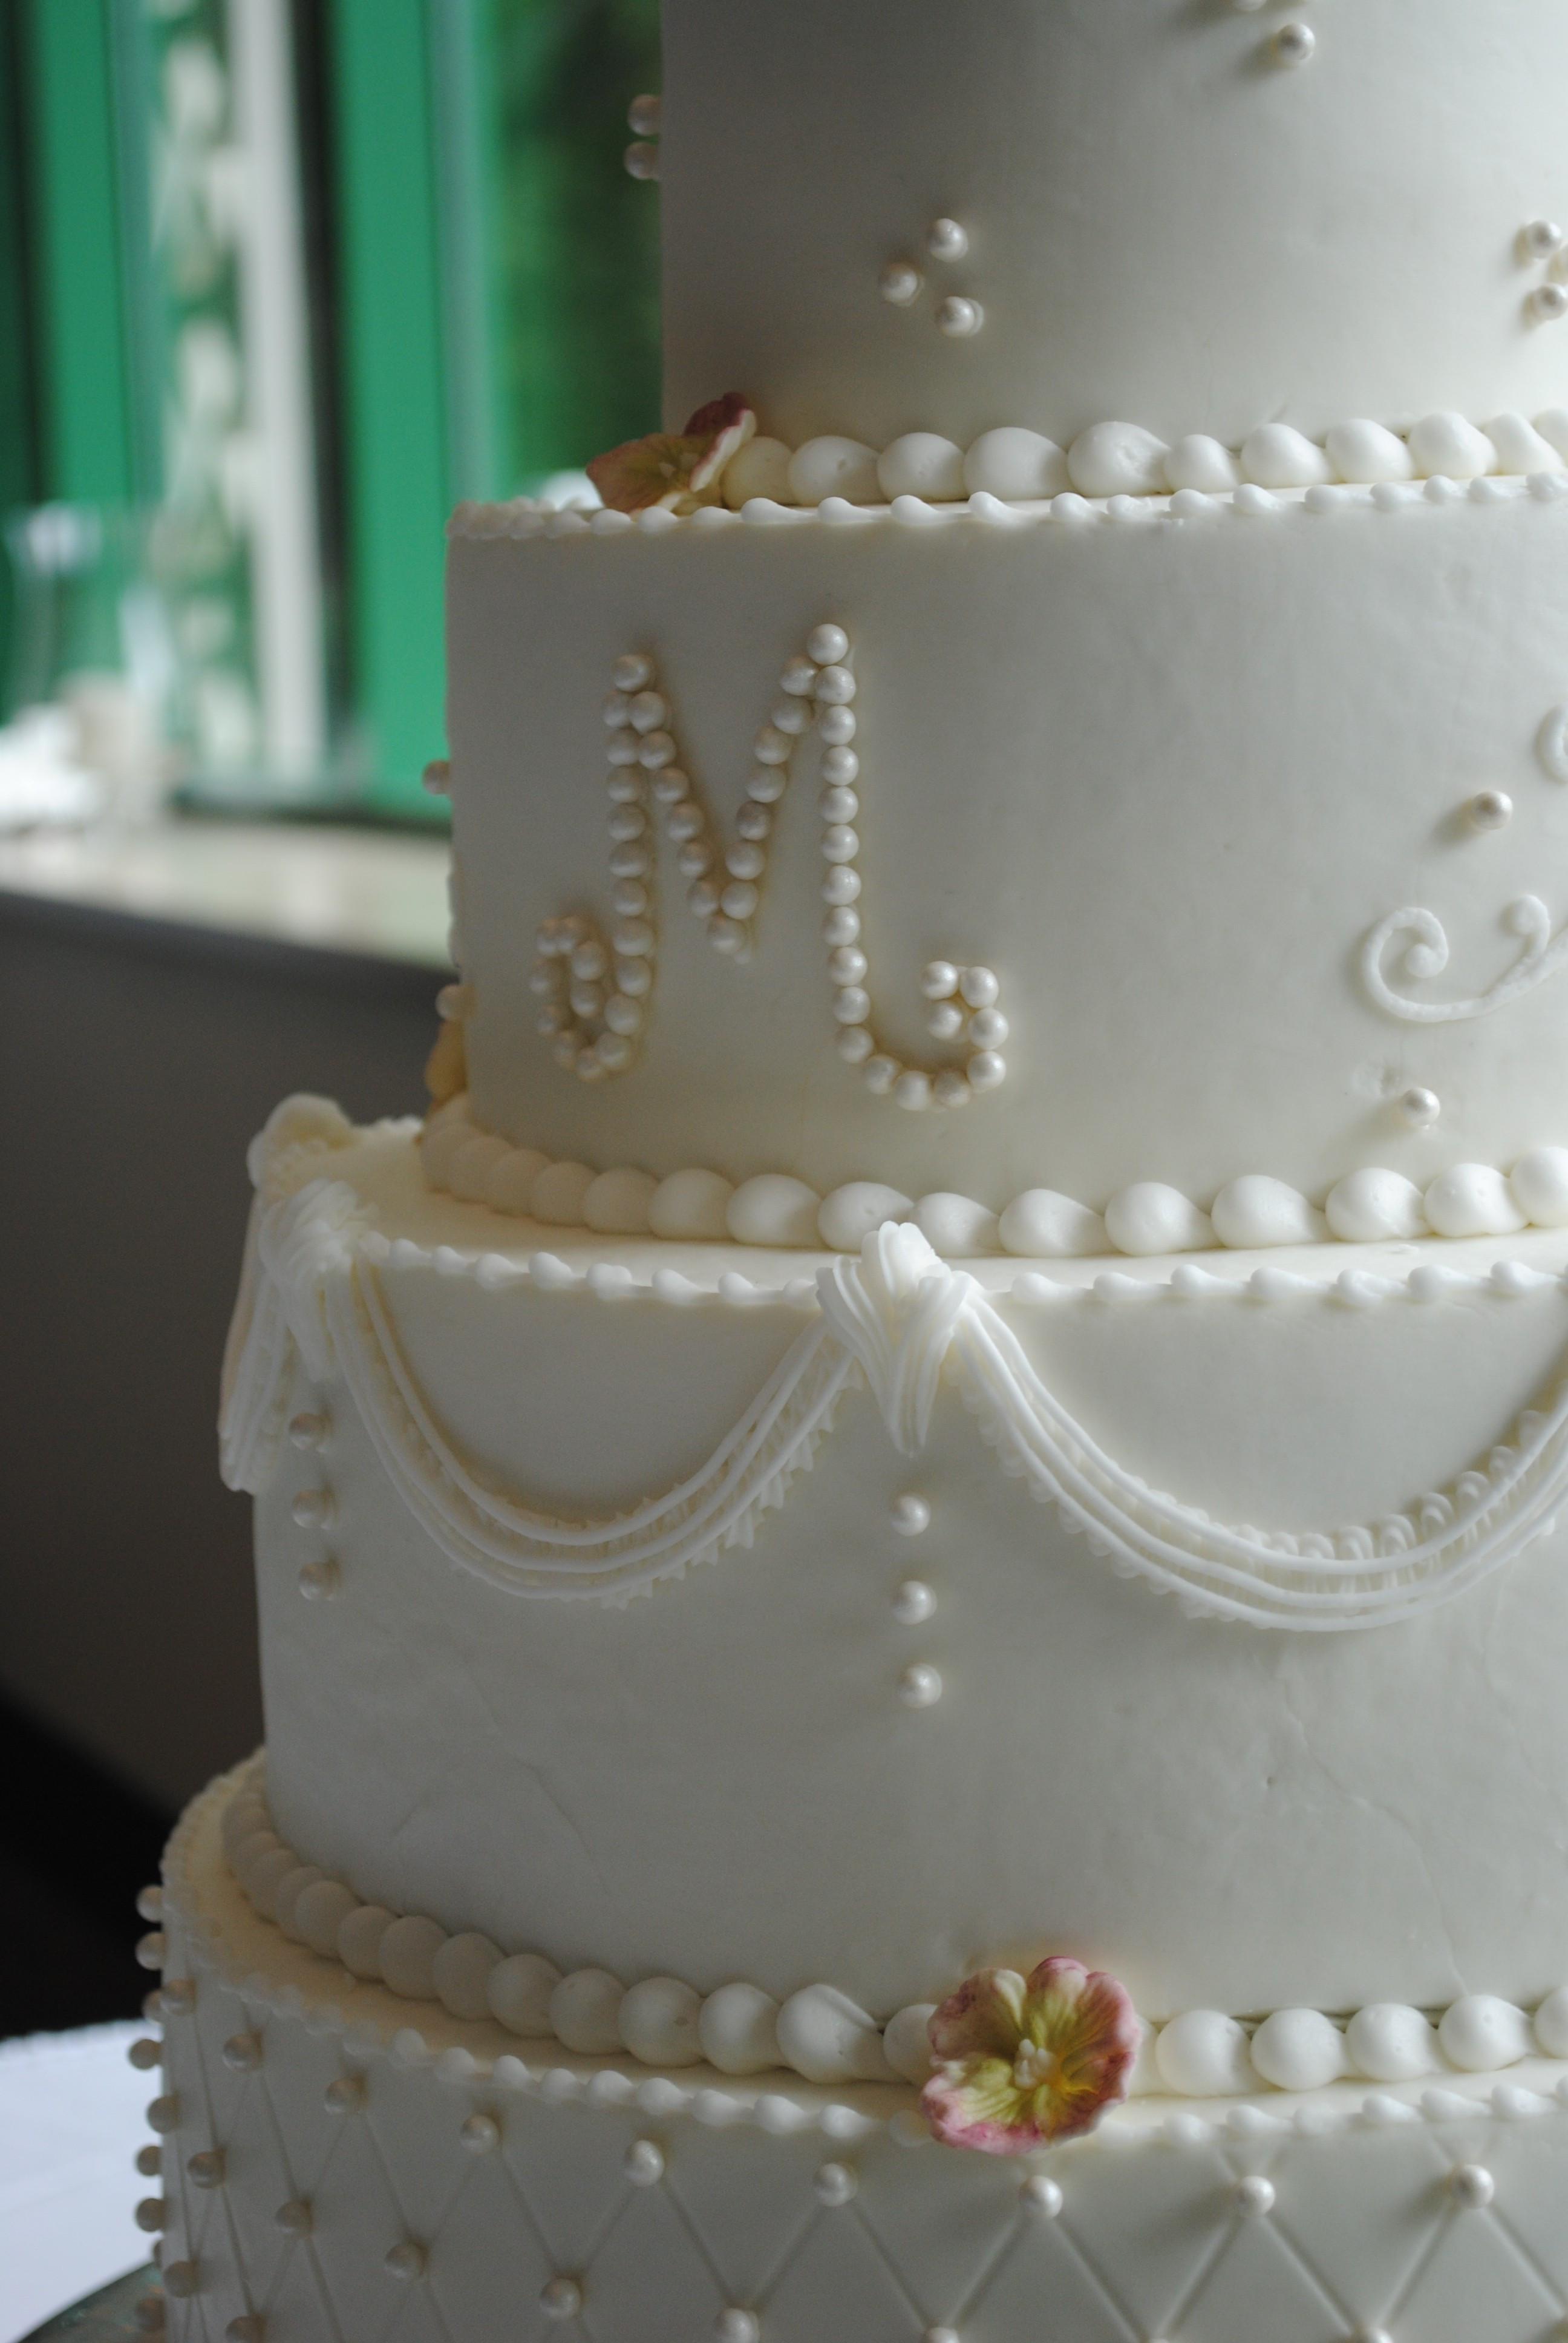 Wedding Cakes Decorated  Buttercream Wedding Cake Options Kathy and pany Wedding